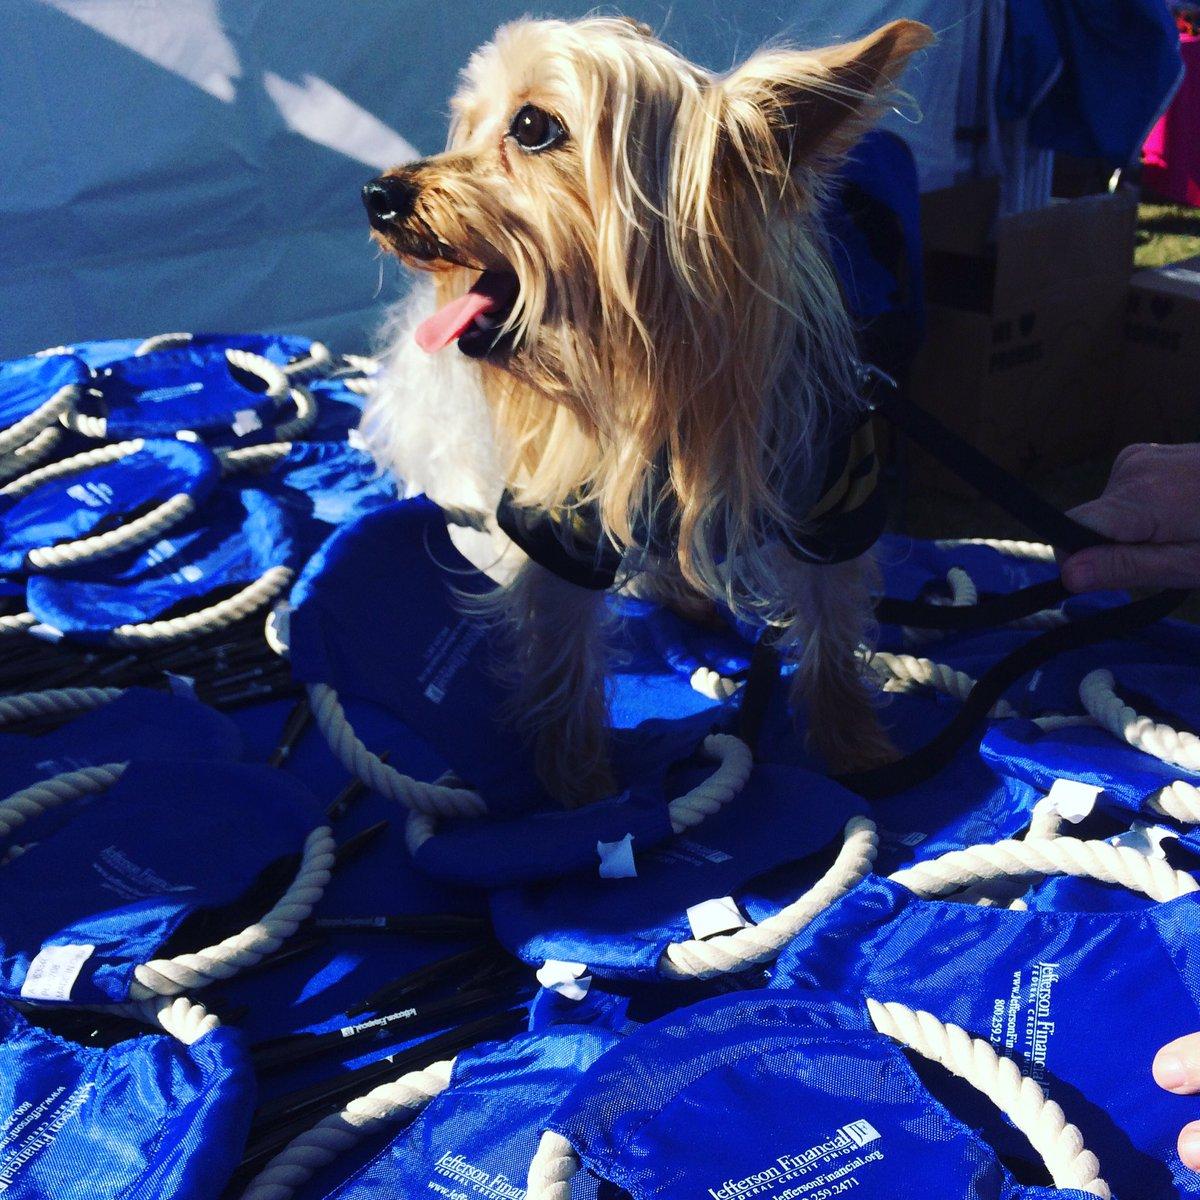 Our #Yorkie mascot Jaxon is giving away frisbees @JeffersonSPCA #PetFest #Lafreniere <br>http://pic.twitter.com/k9DCHvesGJ